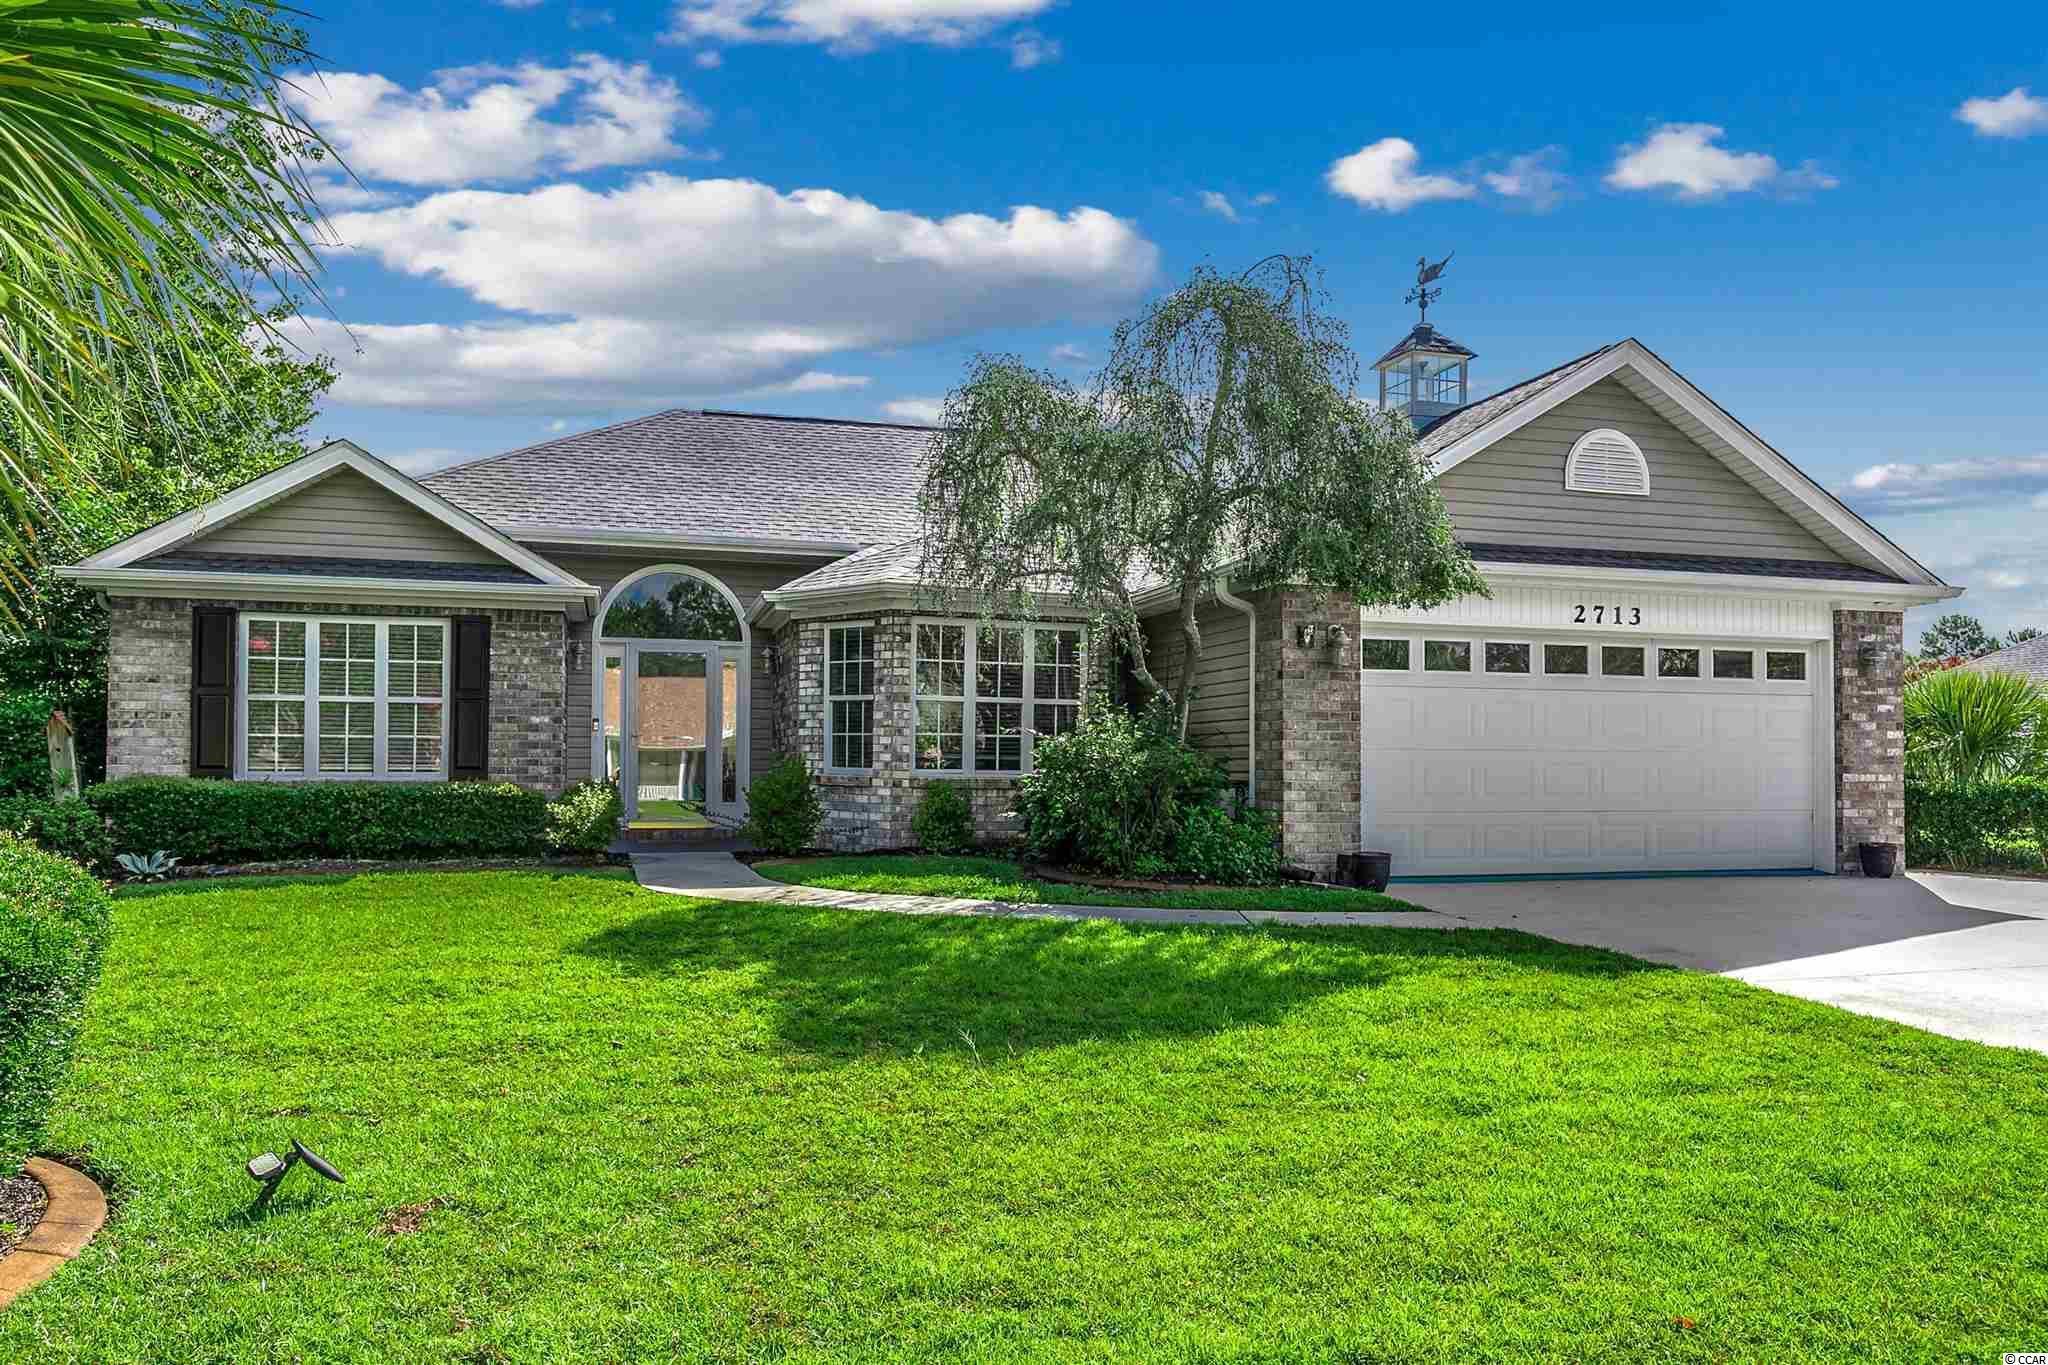 2713 Timberdoodle Ct. Property Photo